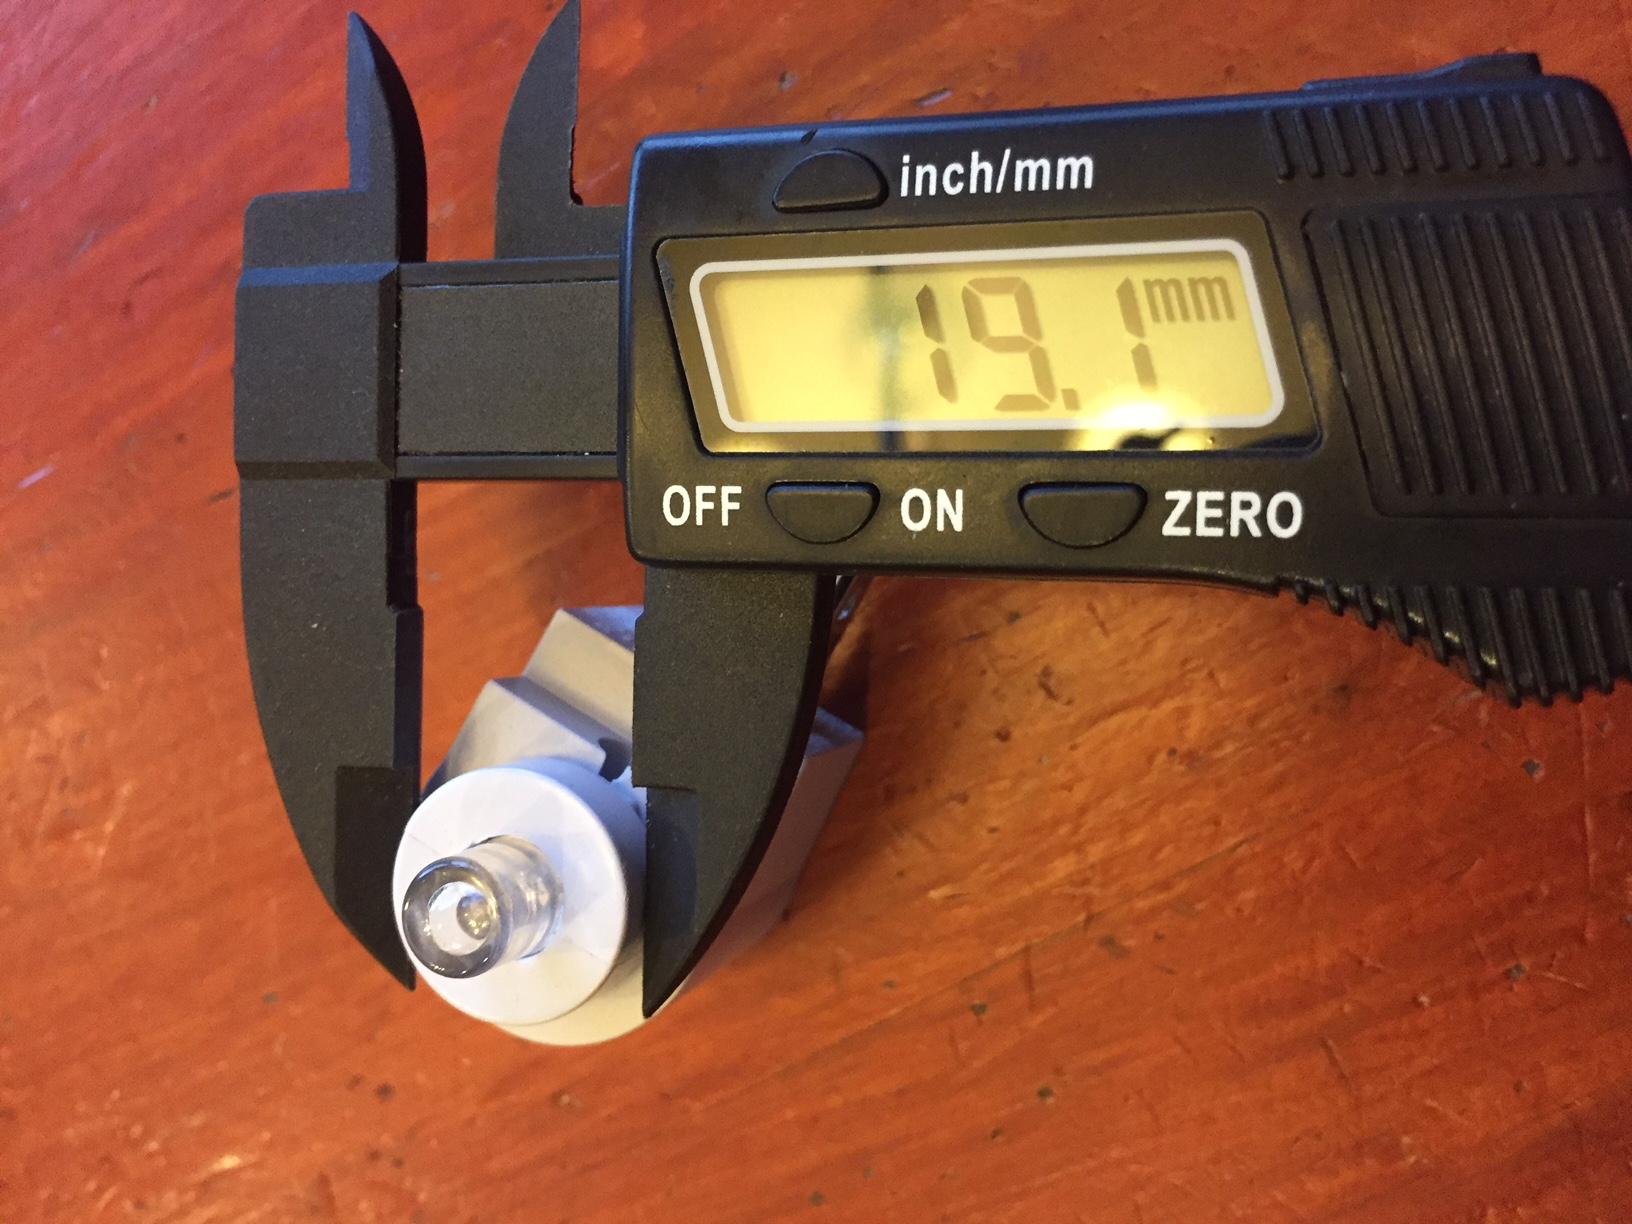 measuring the LED barrel diameter